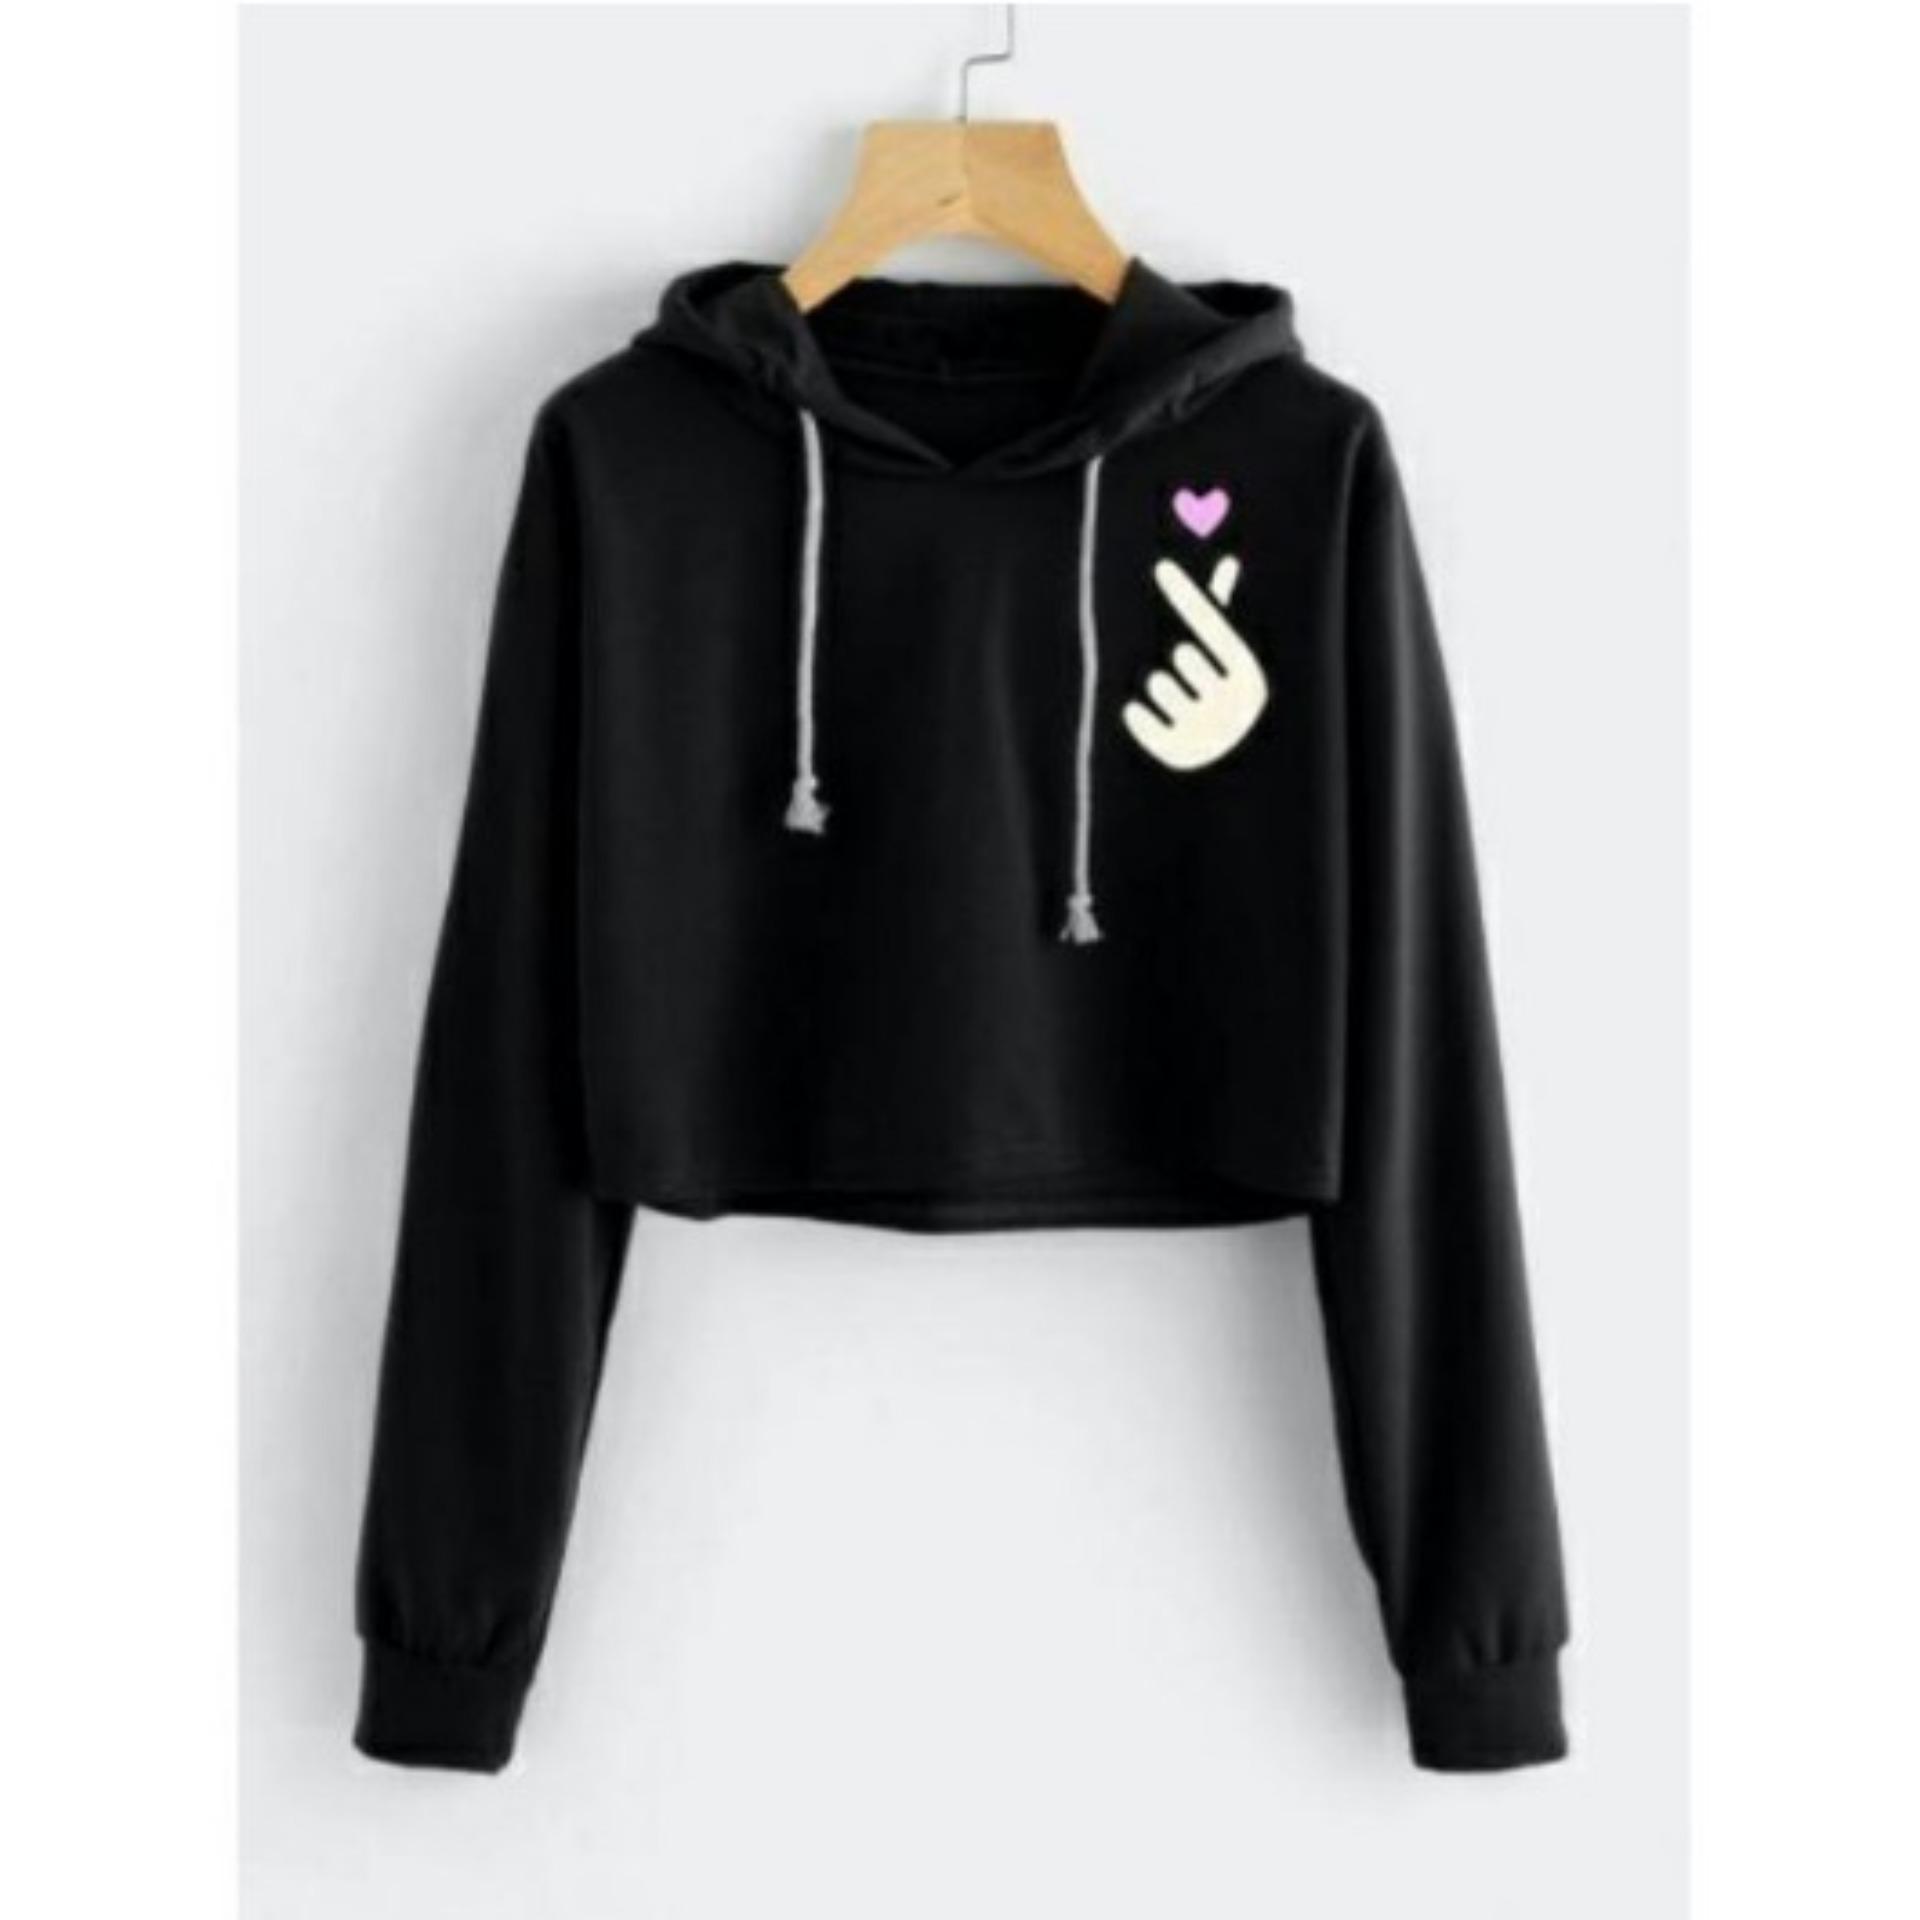 MichelleStore Sweater Wanita Crop BUNGA TULIP - White. Source · HnK Sweater  Wanita Crop Hoodie 91a3fcdcfc